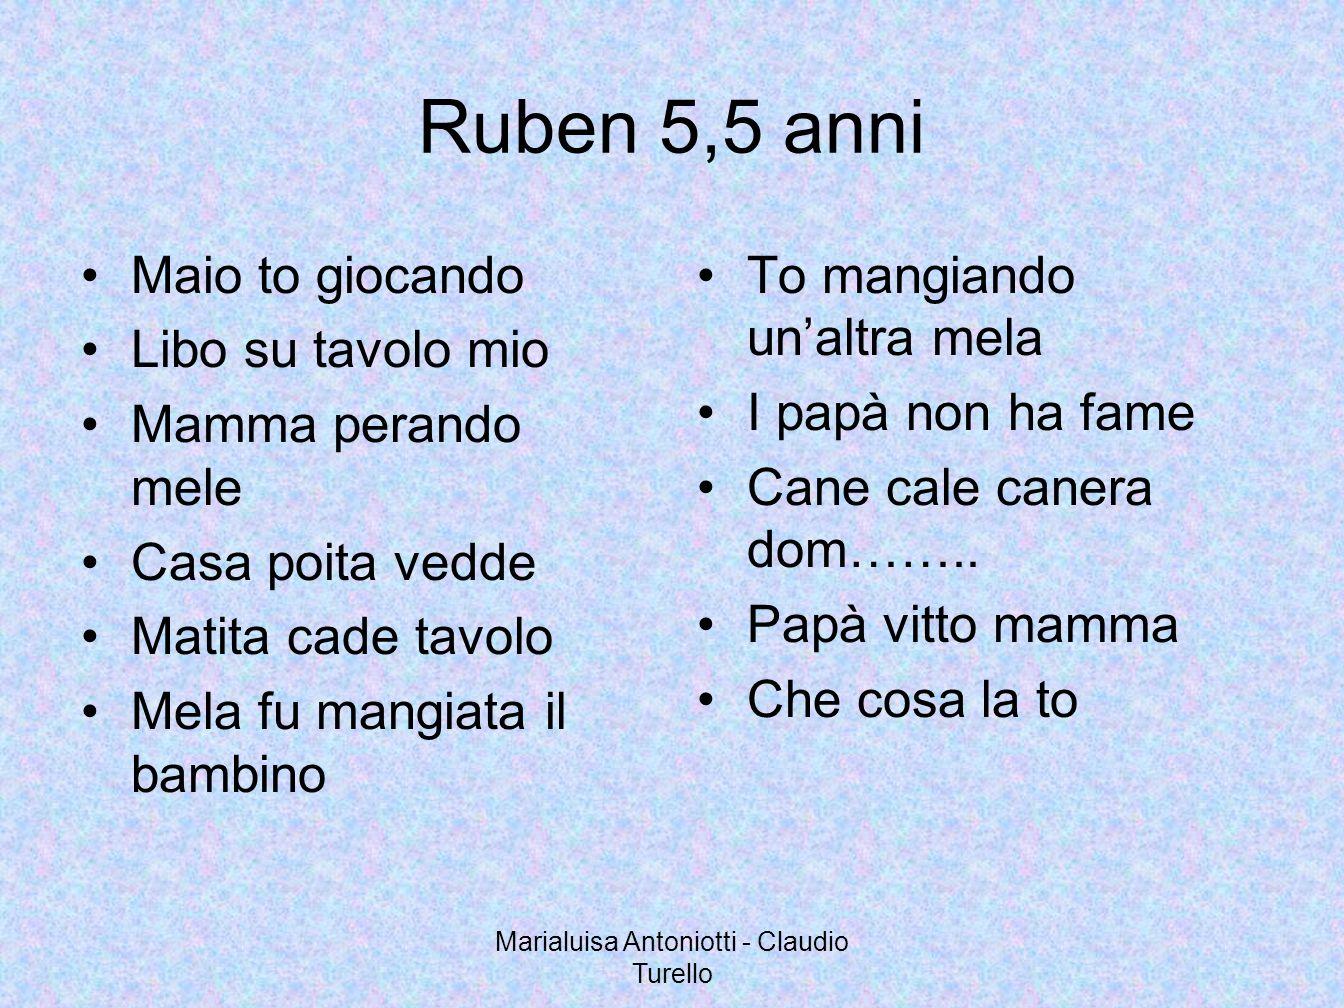 Marialuisa Antoniotti - Claudio Turello Ruben 5,5 anni Maio to giocando Libo su tavolo mio Mamma perando mele Casa poita vedde Matita cade tavolo Mela